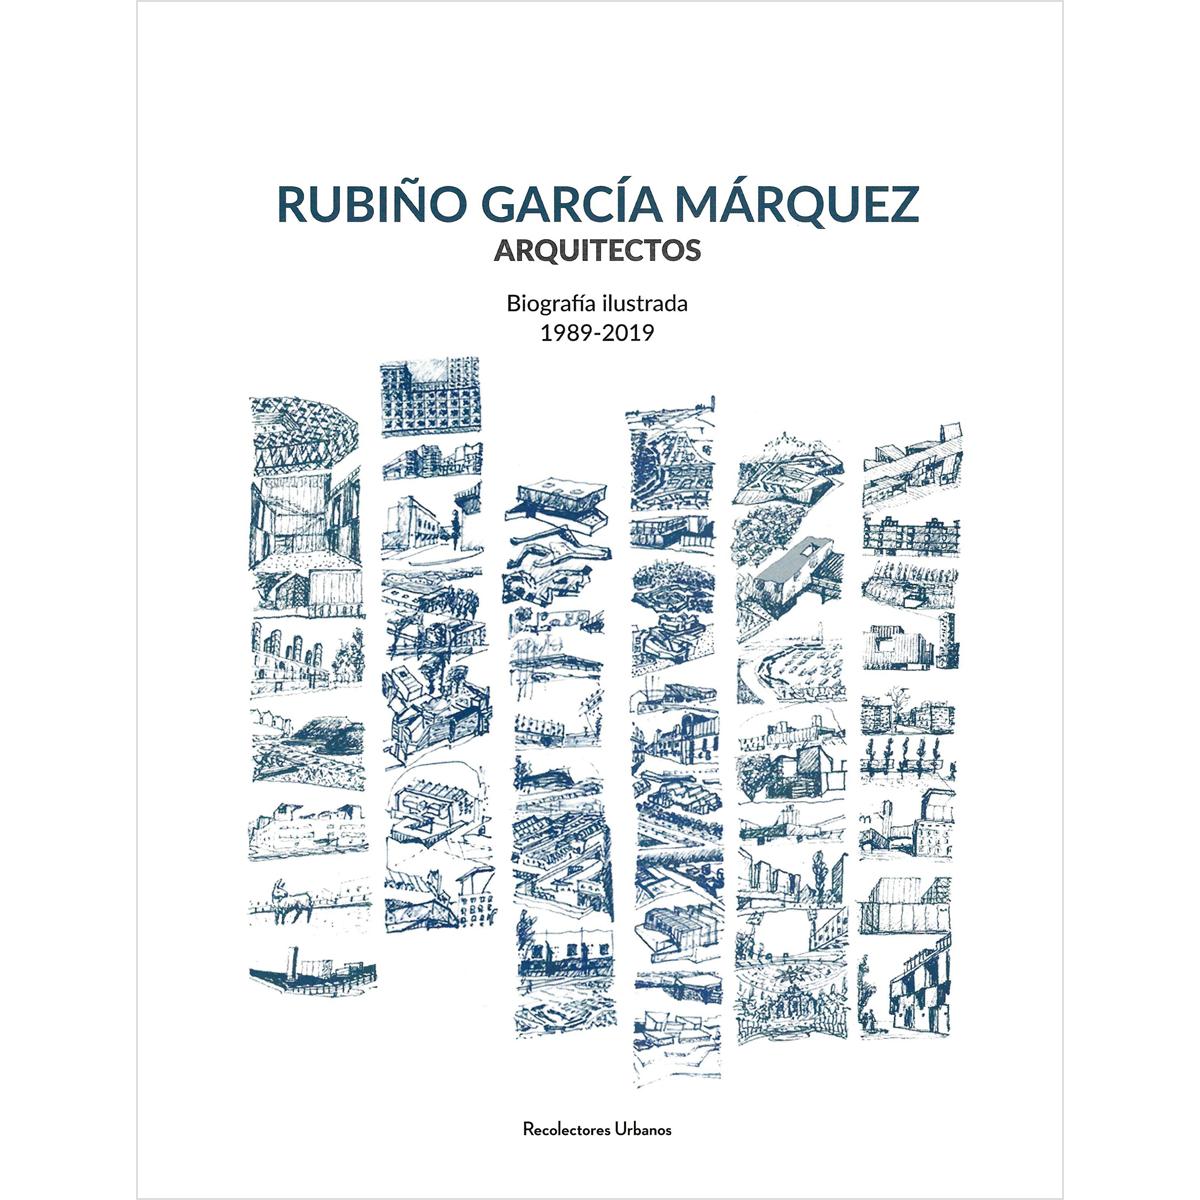 Rubiño García Márquez Arquitectos